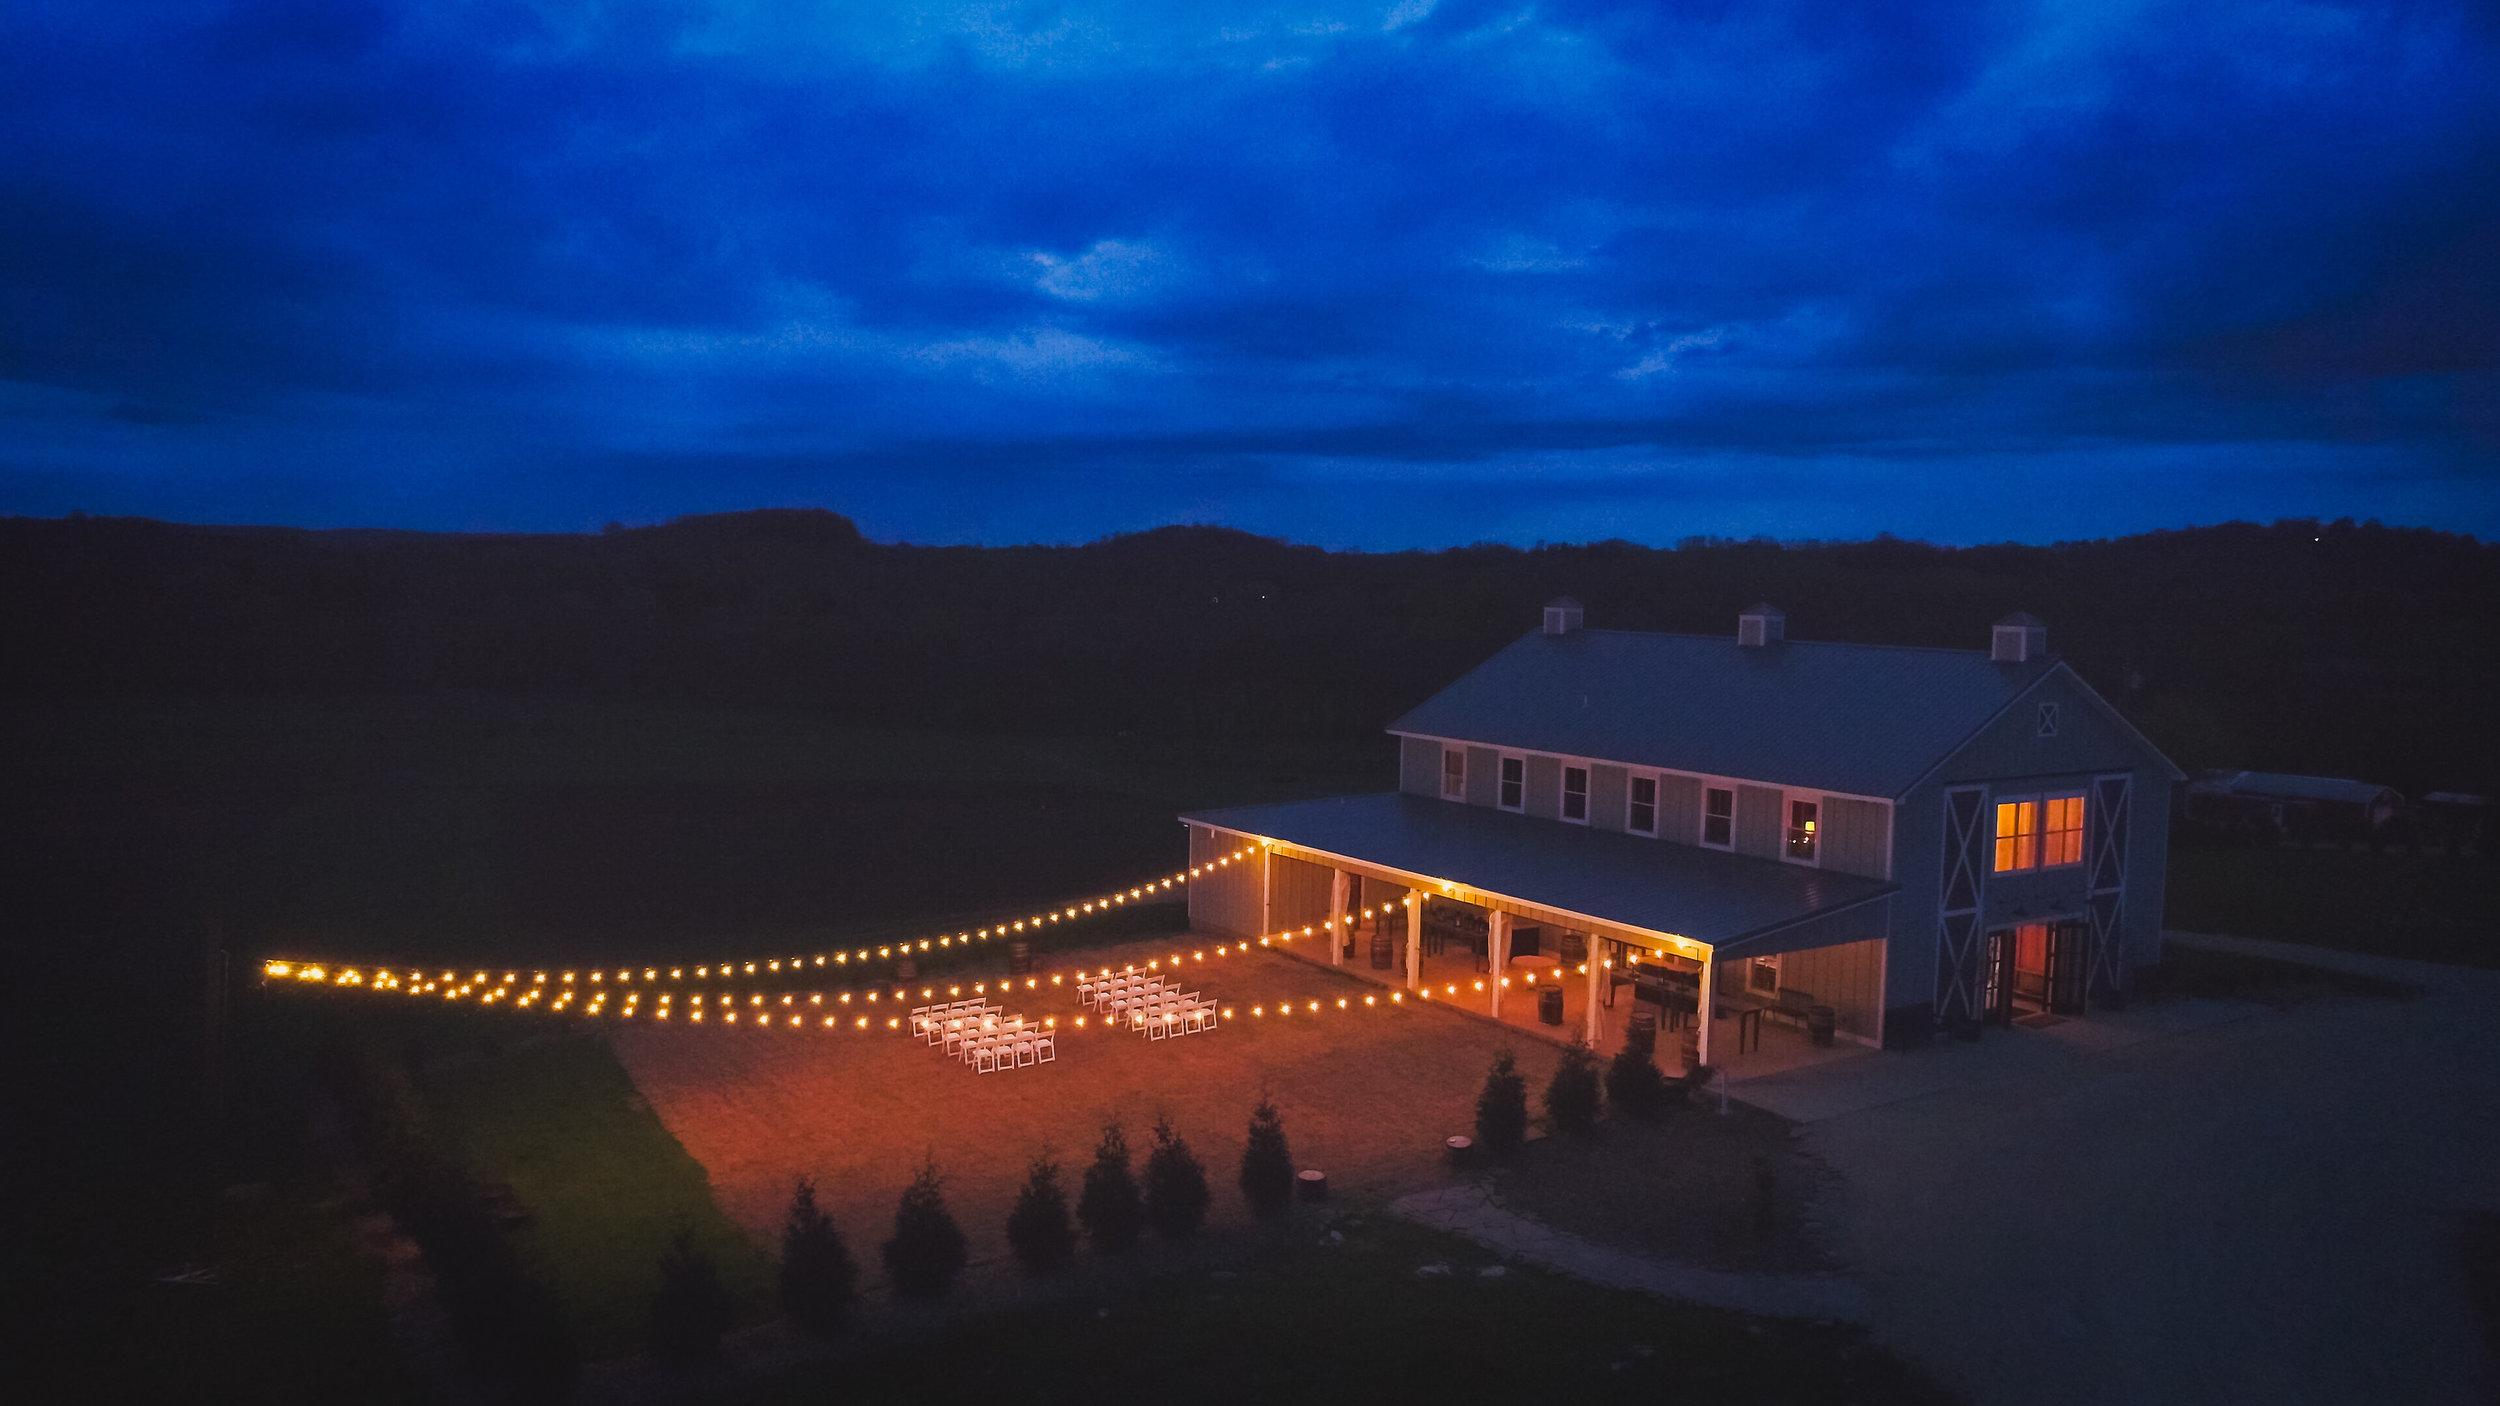 Allenbrooke-Farms-Nashville-Wedding-Photographers 17.jpg